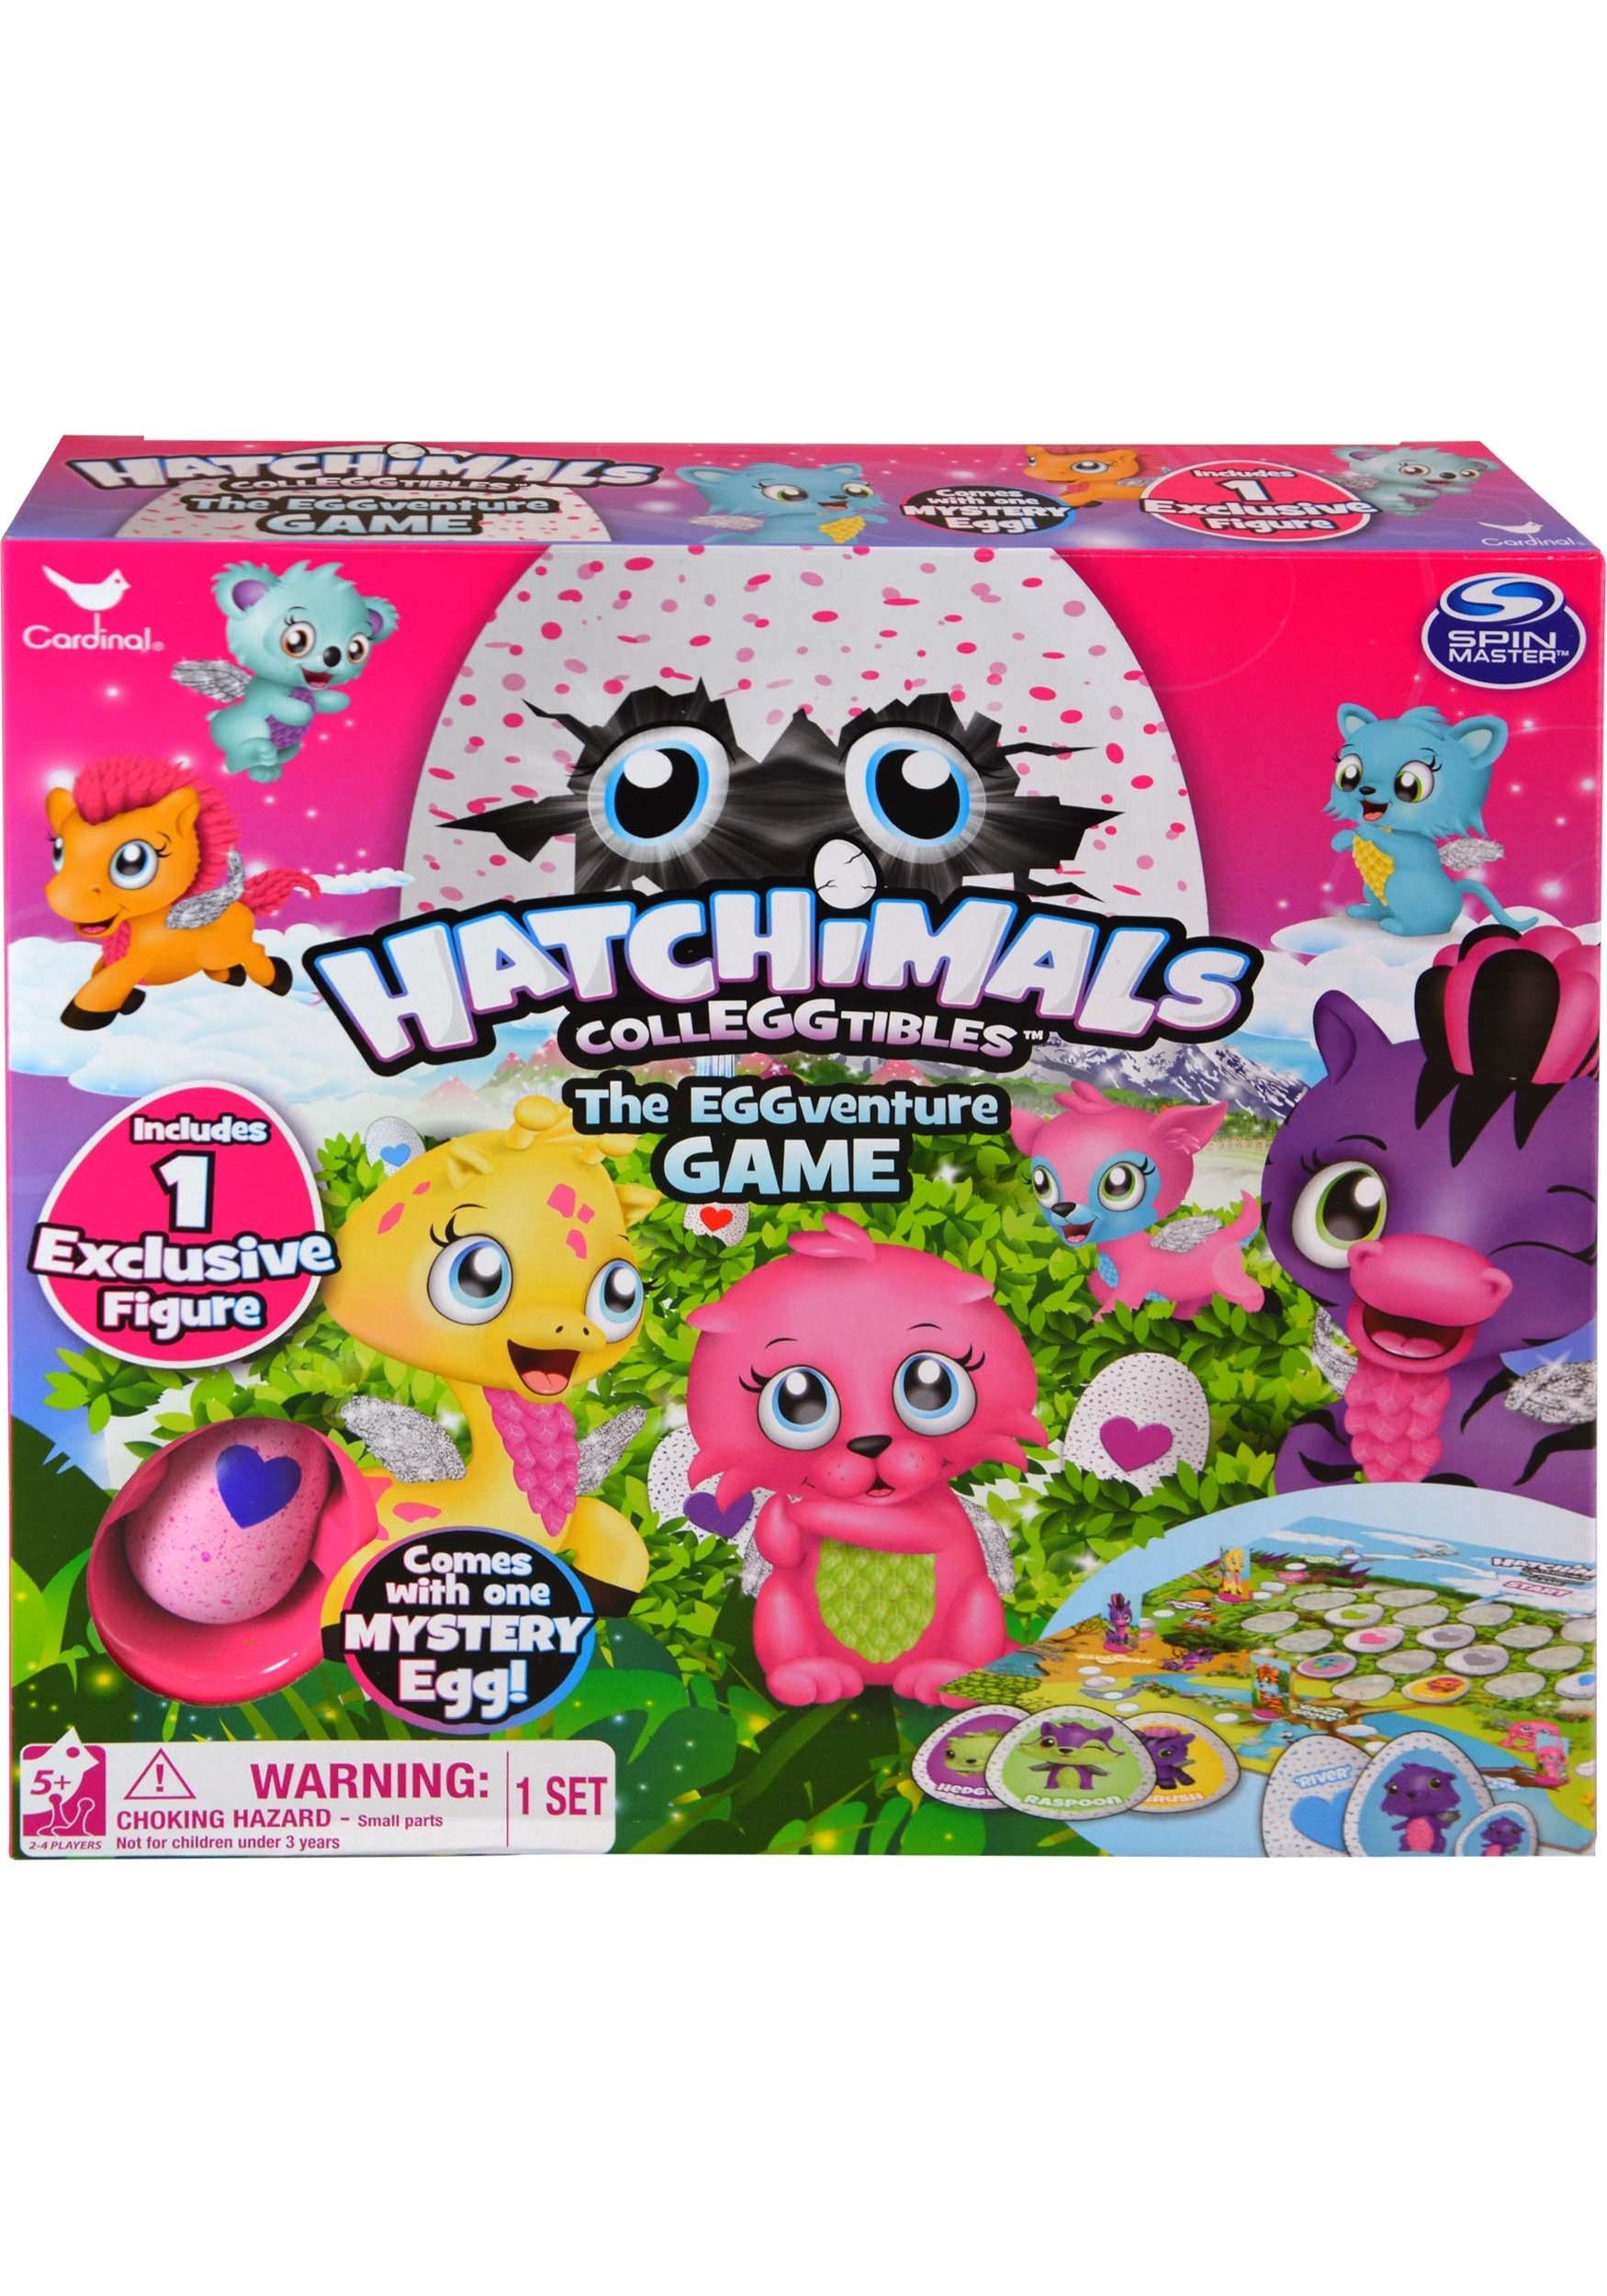 Hatchimal Eggventure Game